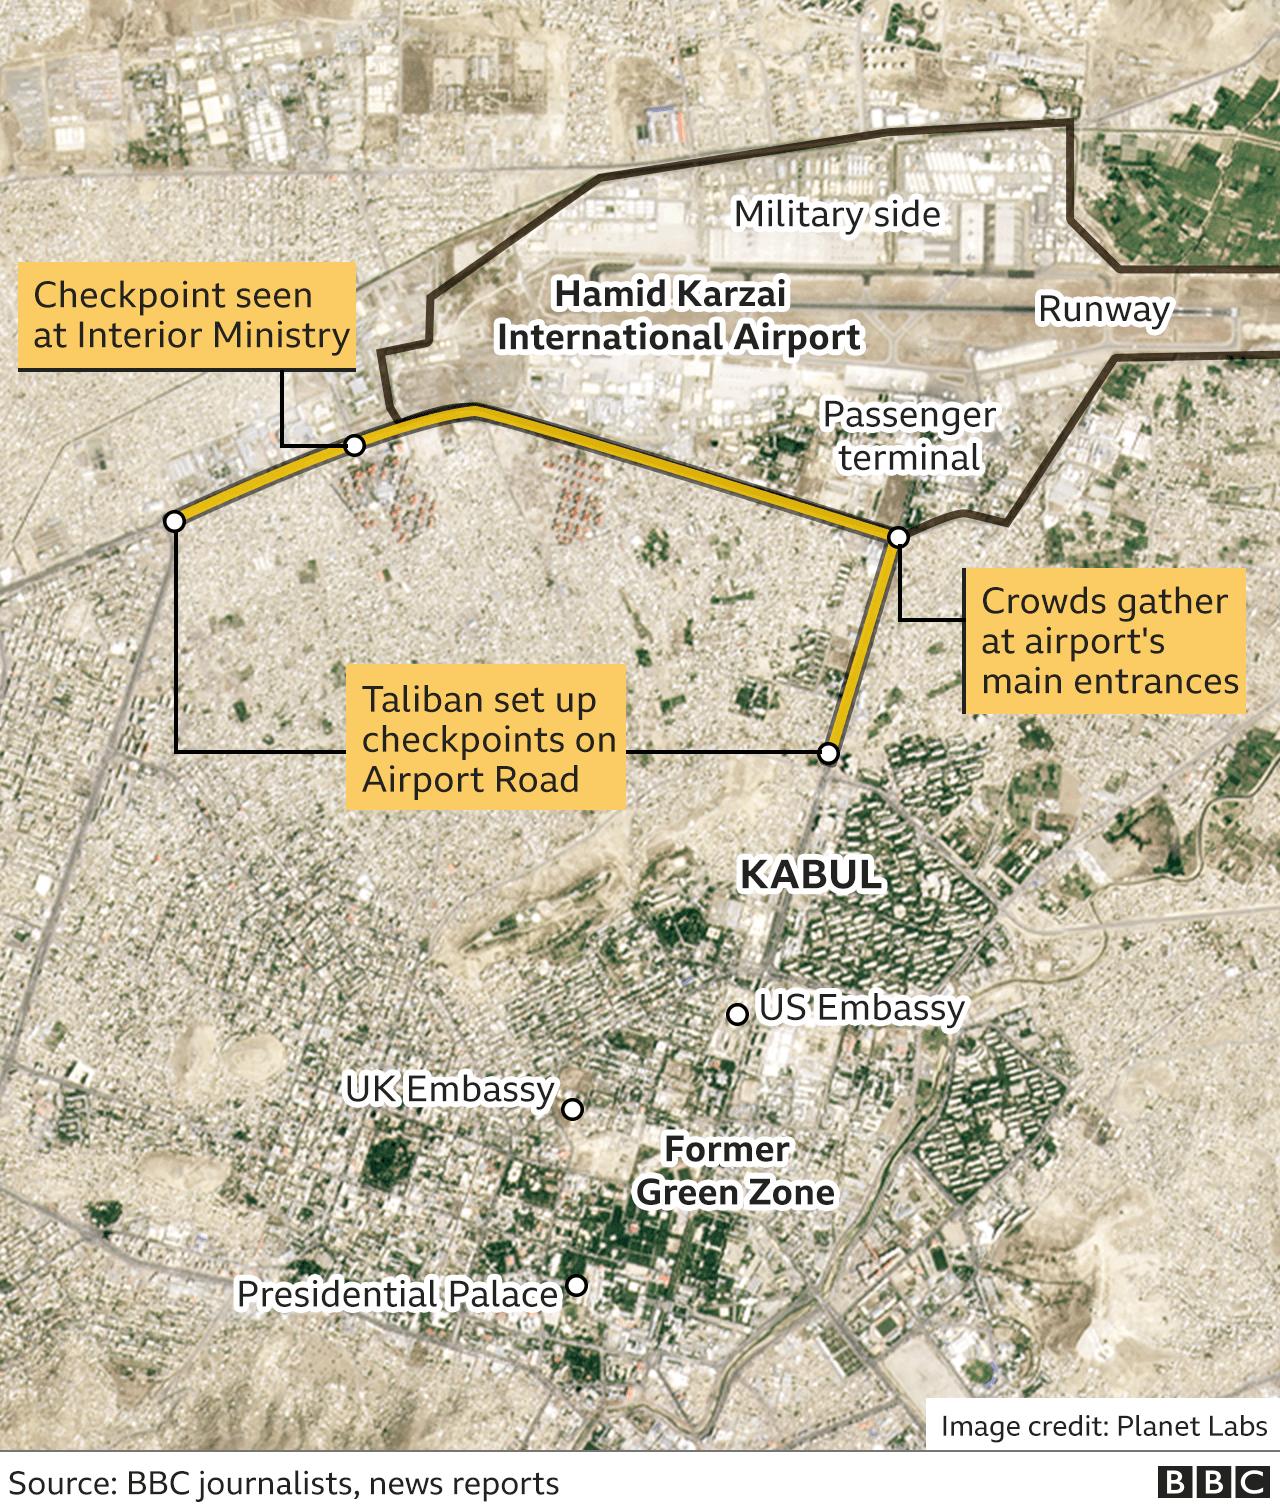 Map showing detail around Kabul airport